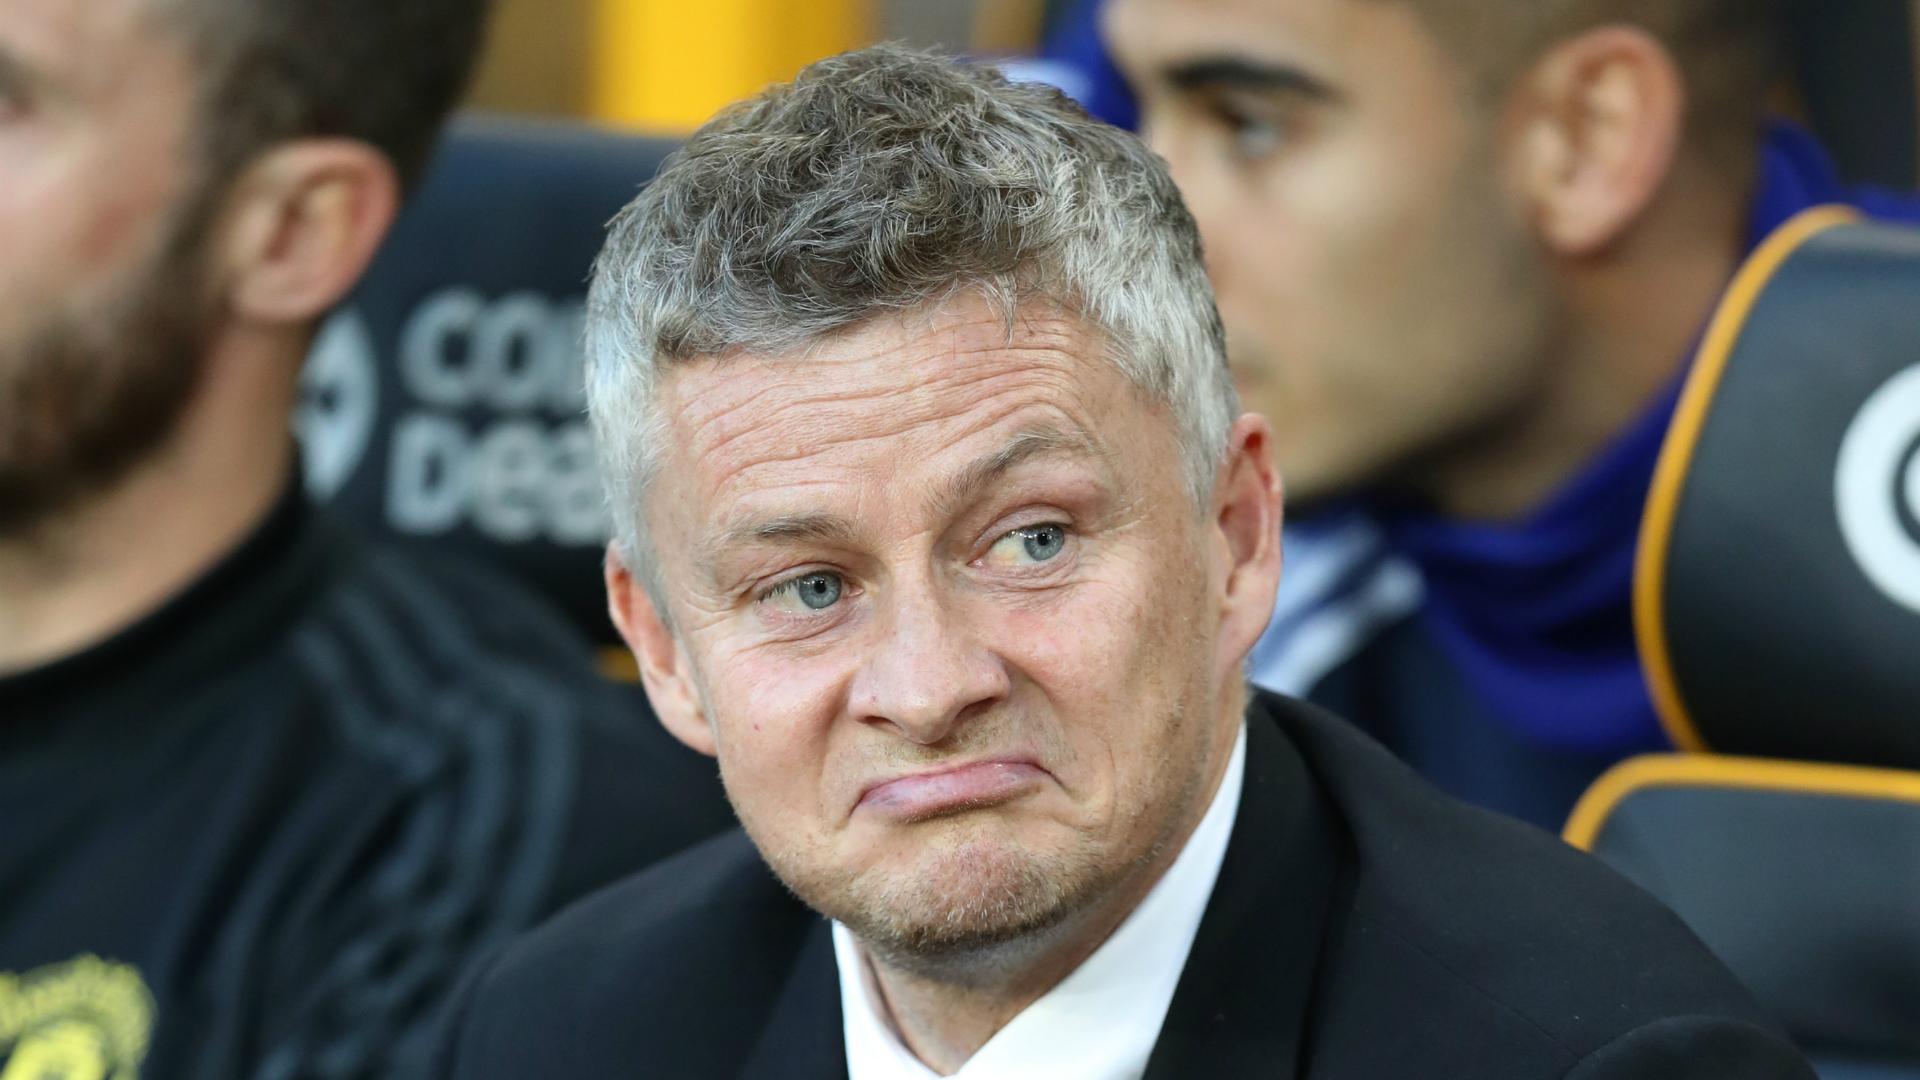 Solskjaer believes Man United heading in right direction despite results